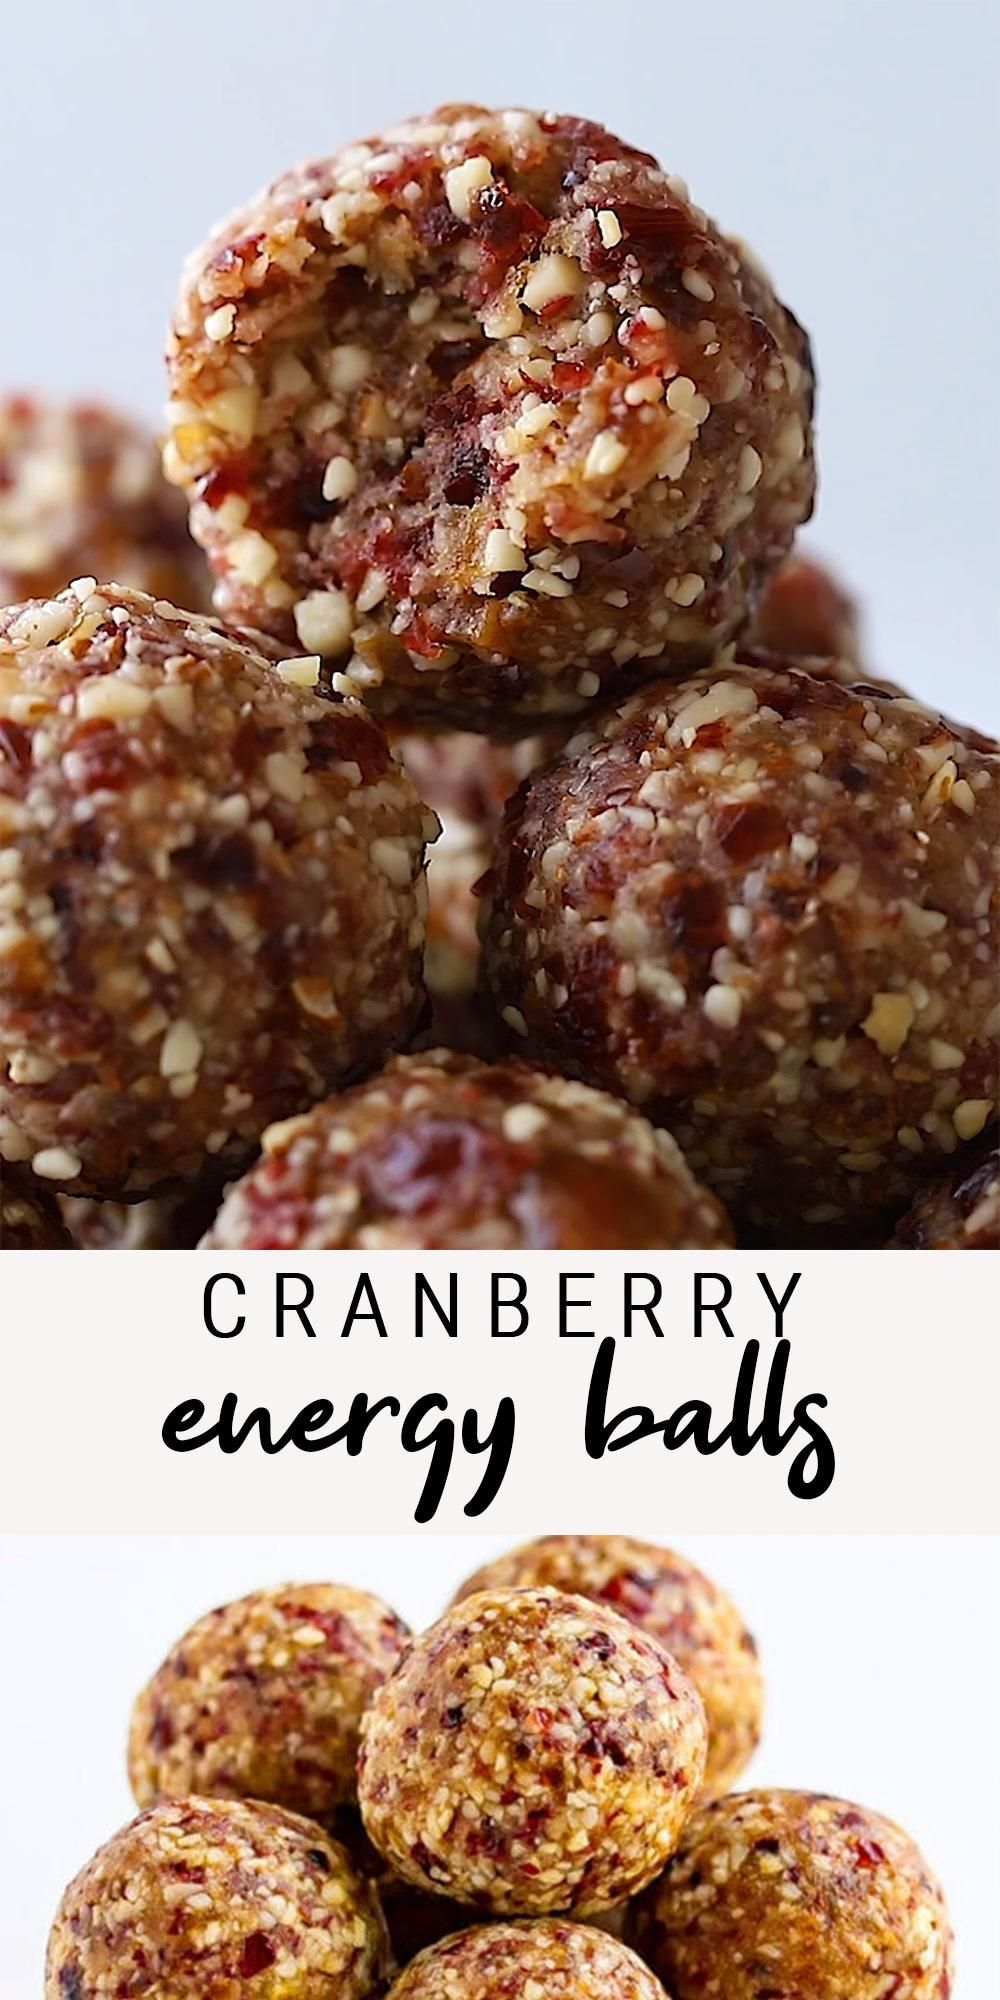 Cranberry Energy Balls | Healthy No Bake Snack | V